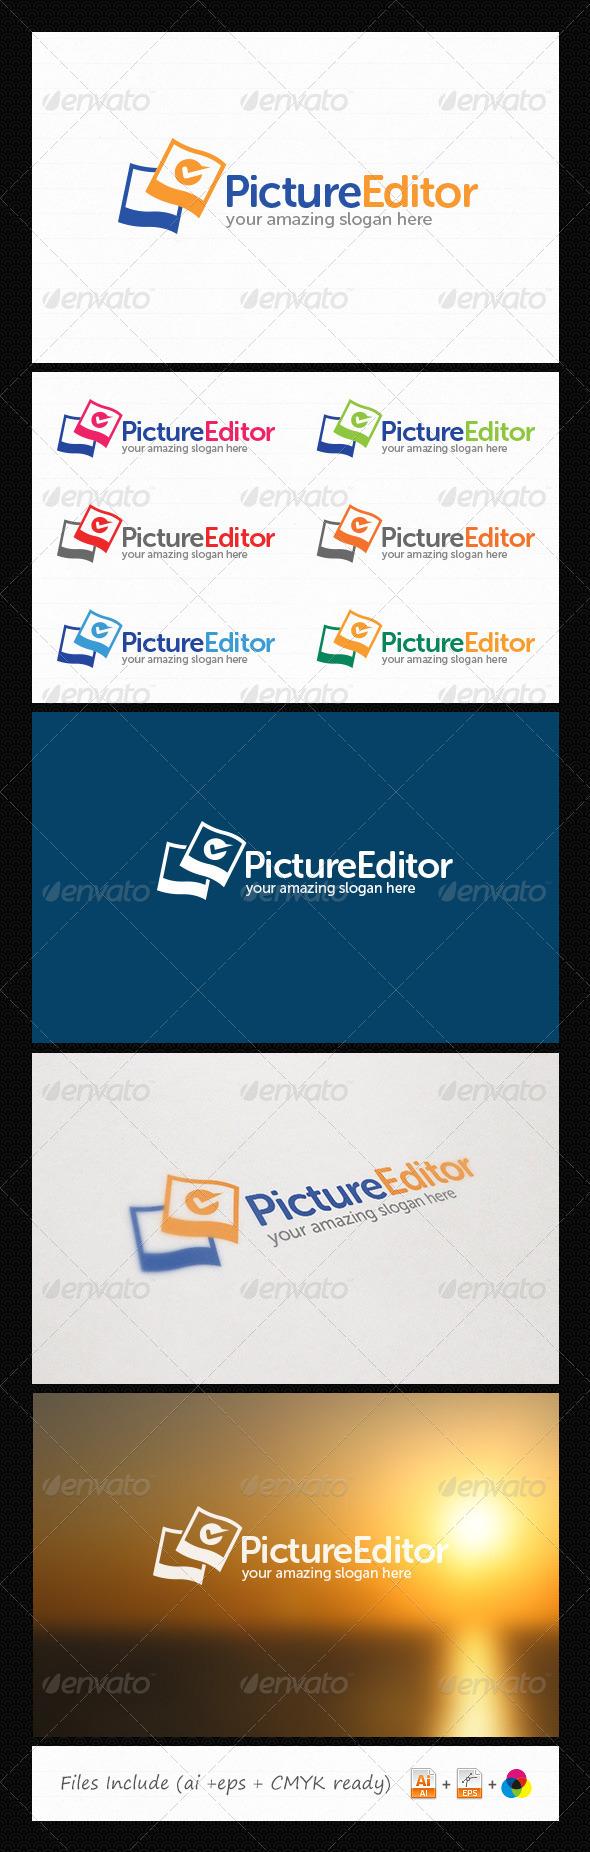 GraphicRiver Image Editor Logo 6067353